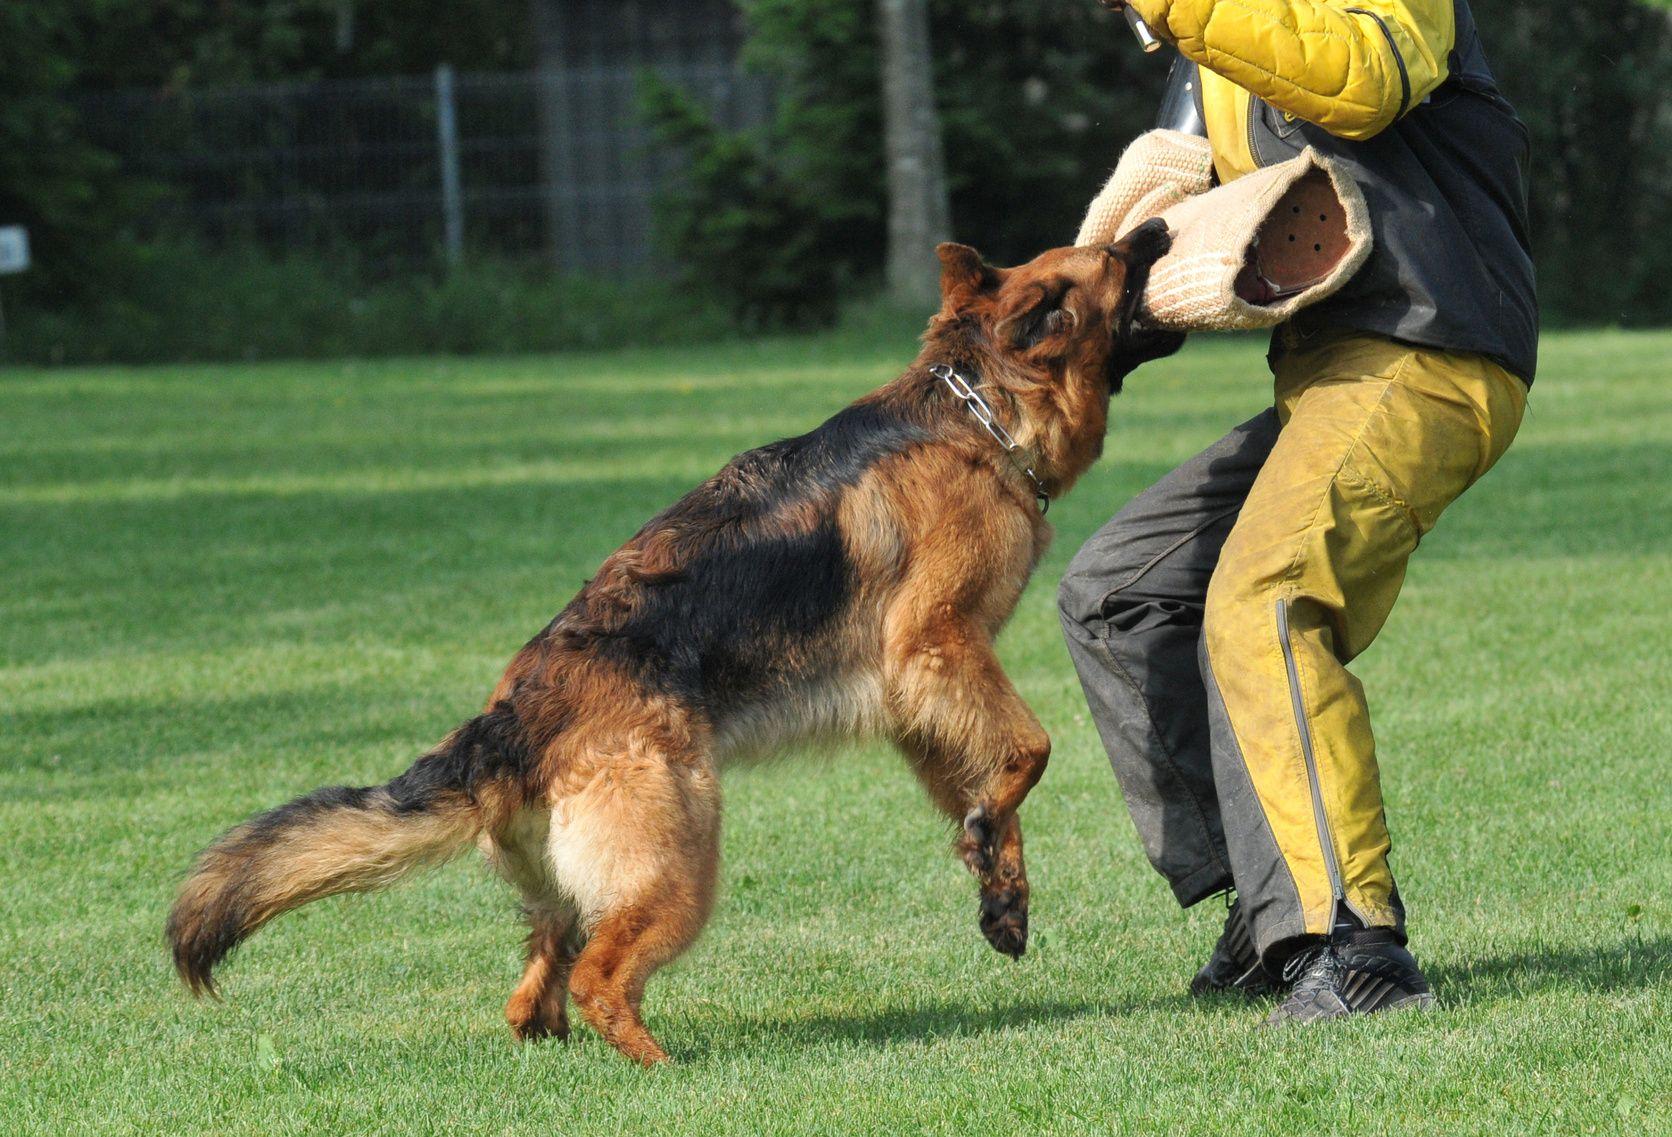 Pitbull Puppies German Shepherd Dogs Dog Training